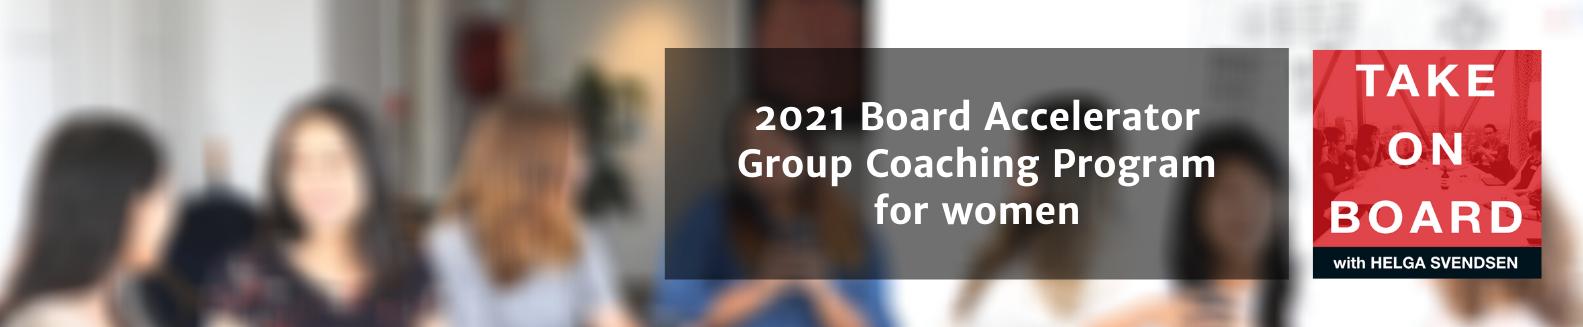 Board Accelerator 2021